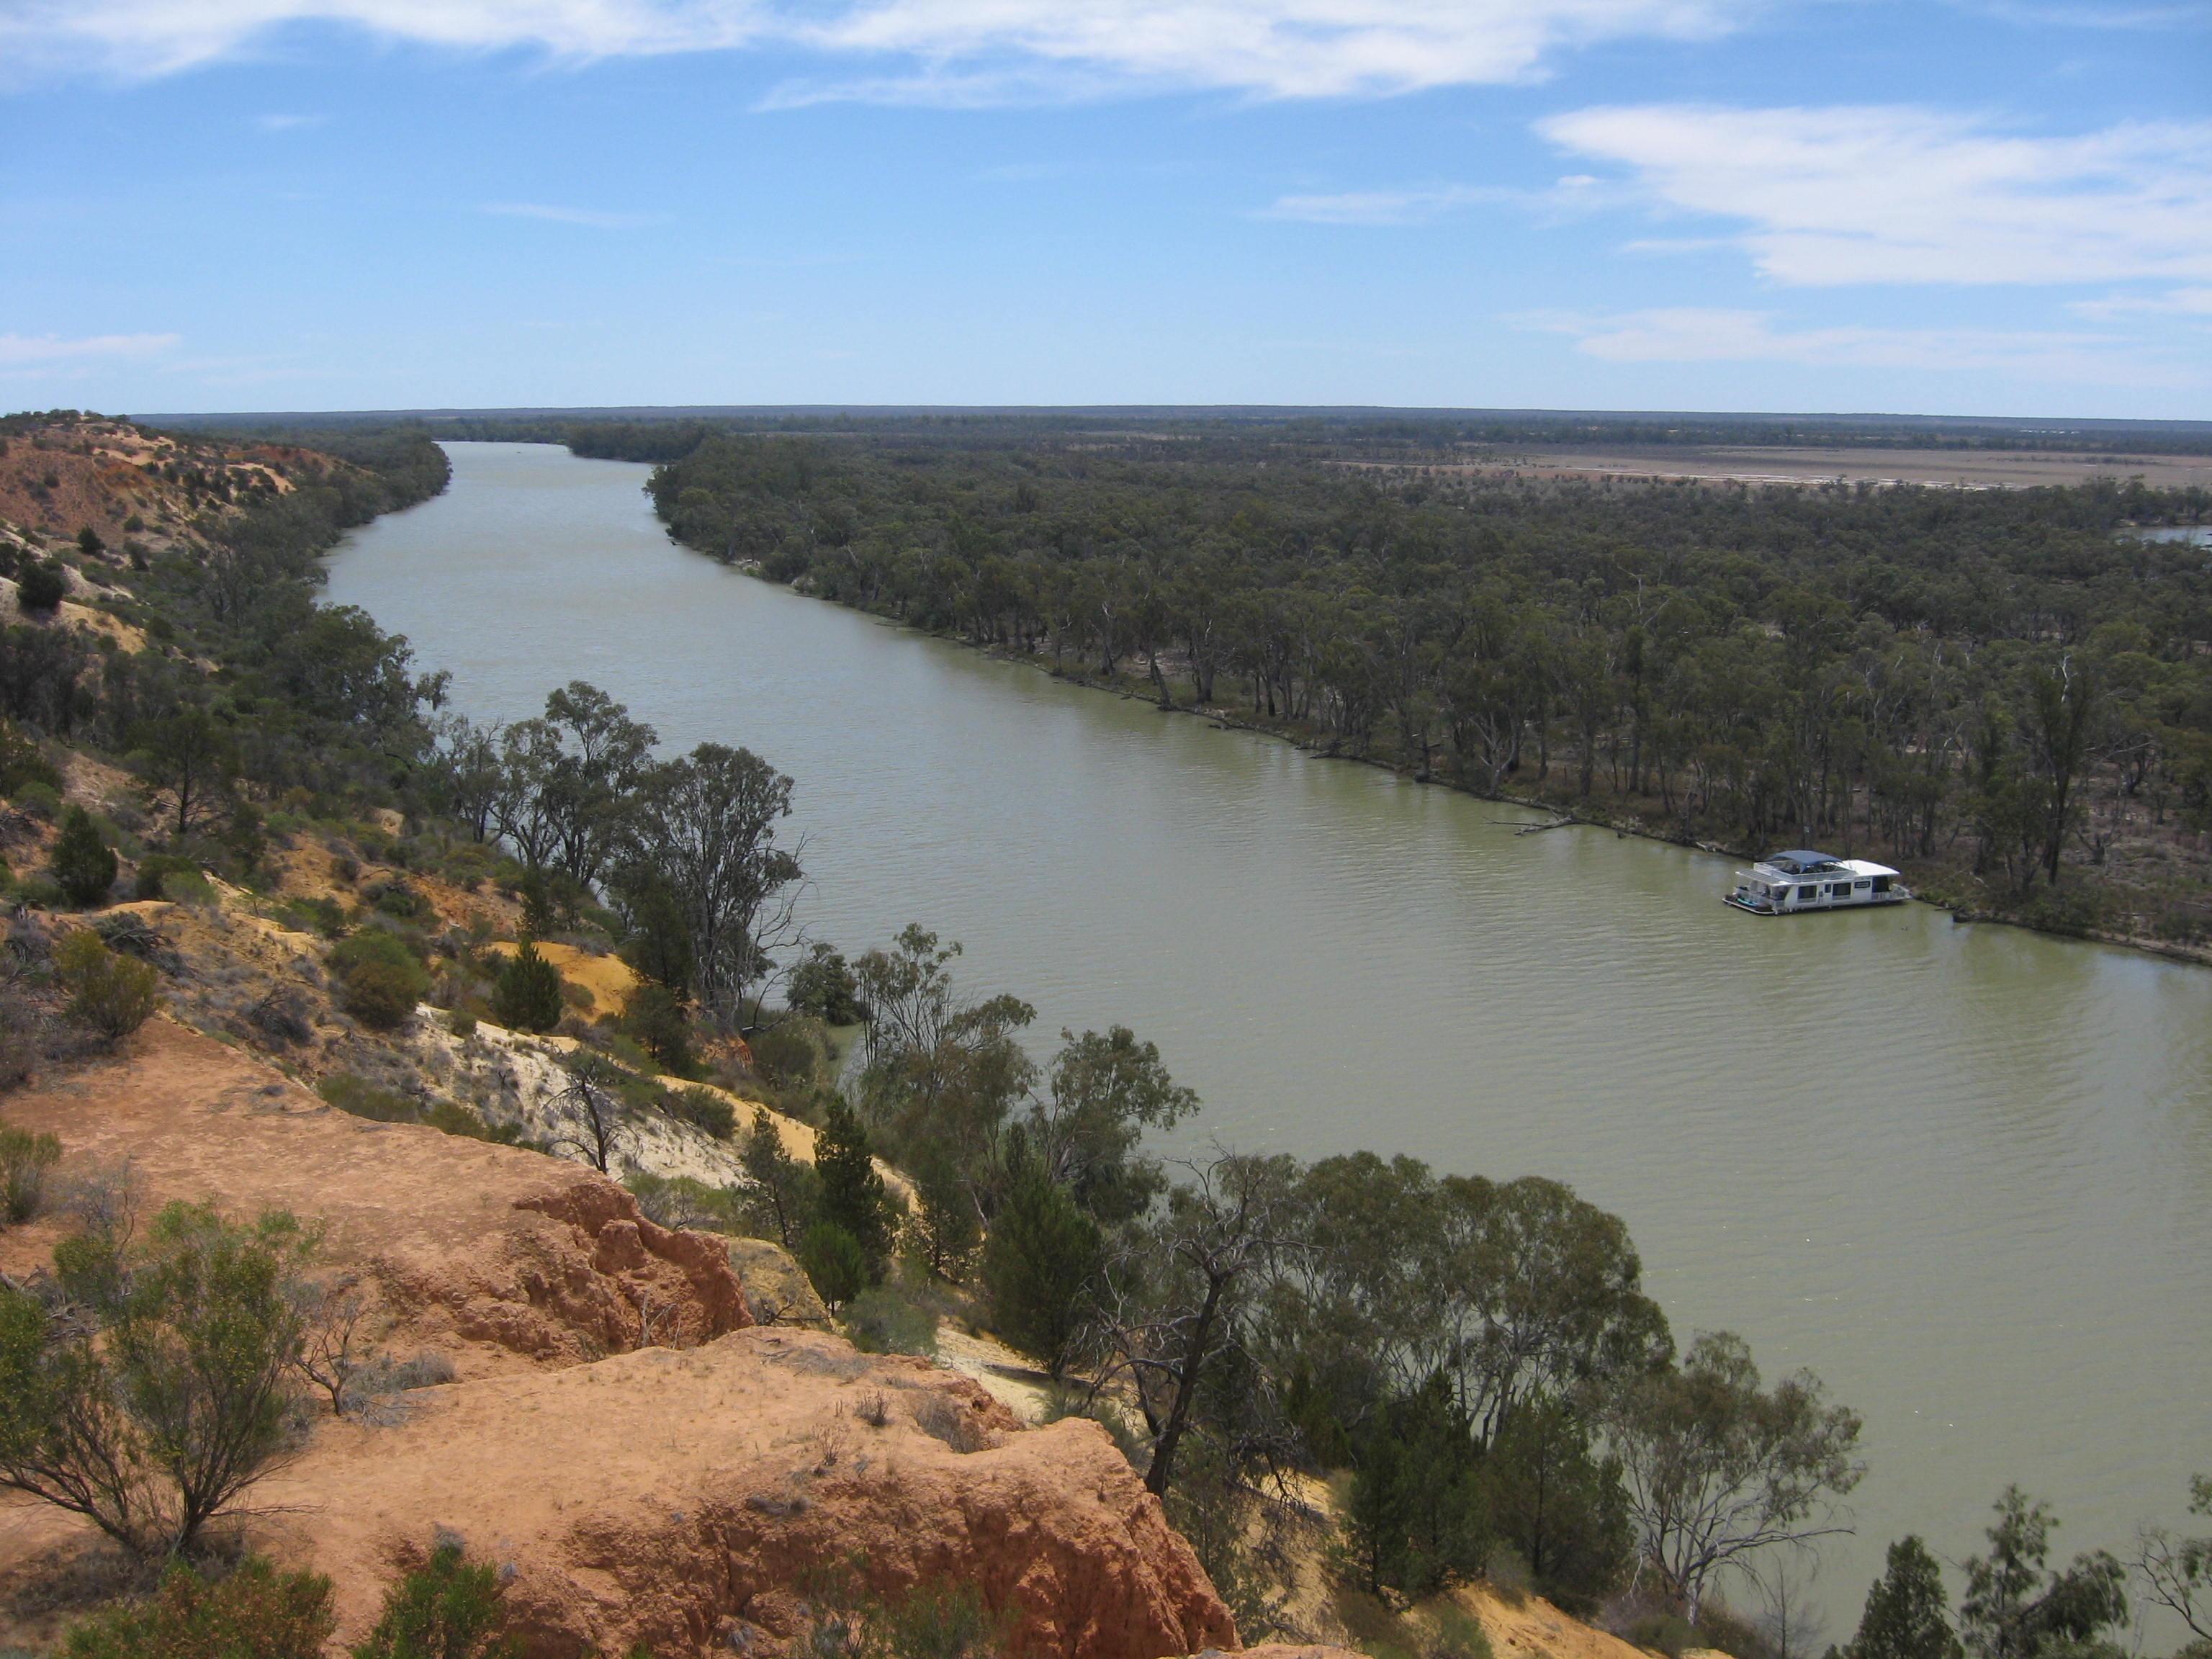 murray_river2c_downstream_of_headings_cliffs2c_south_australia